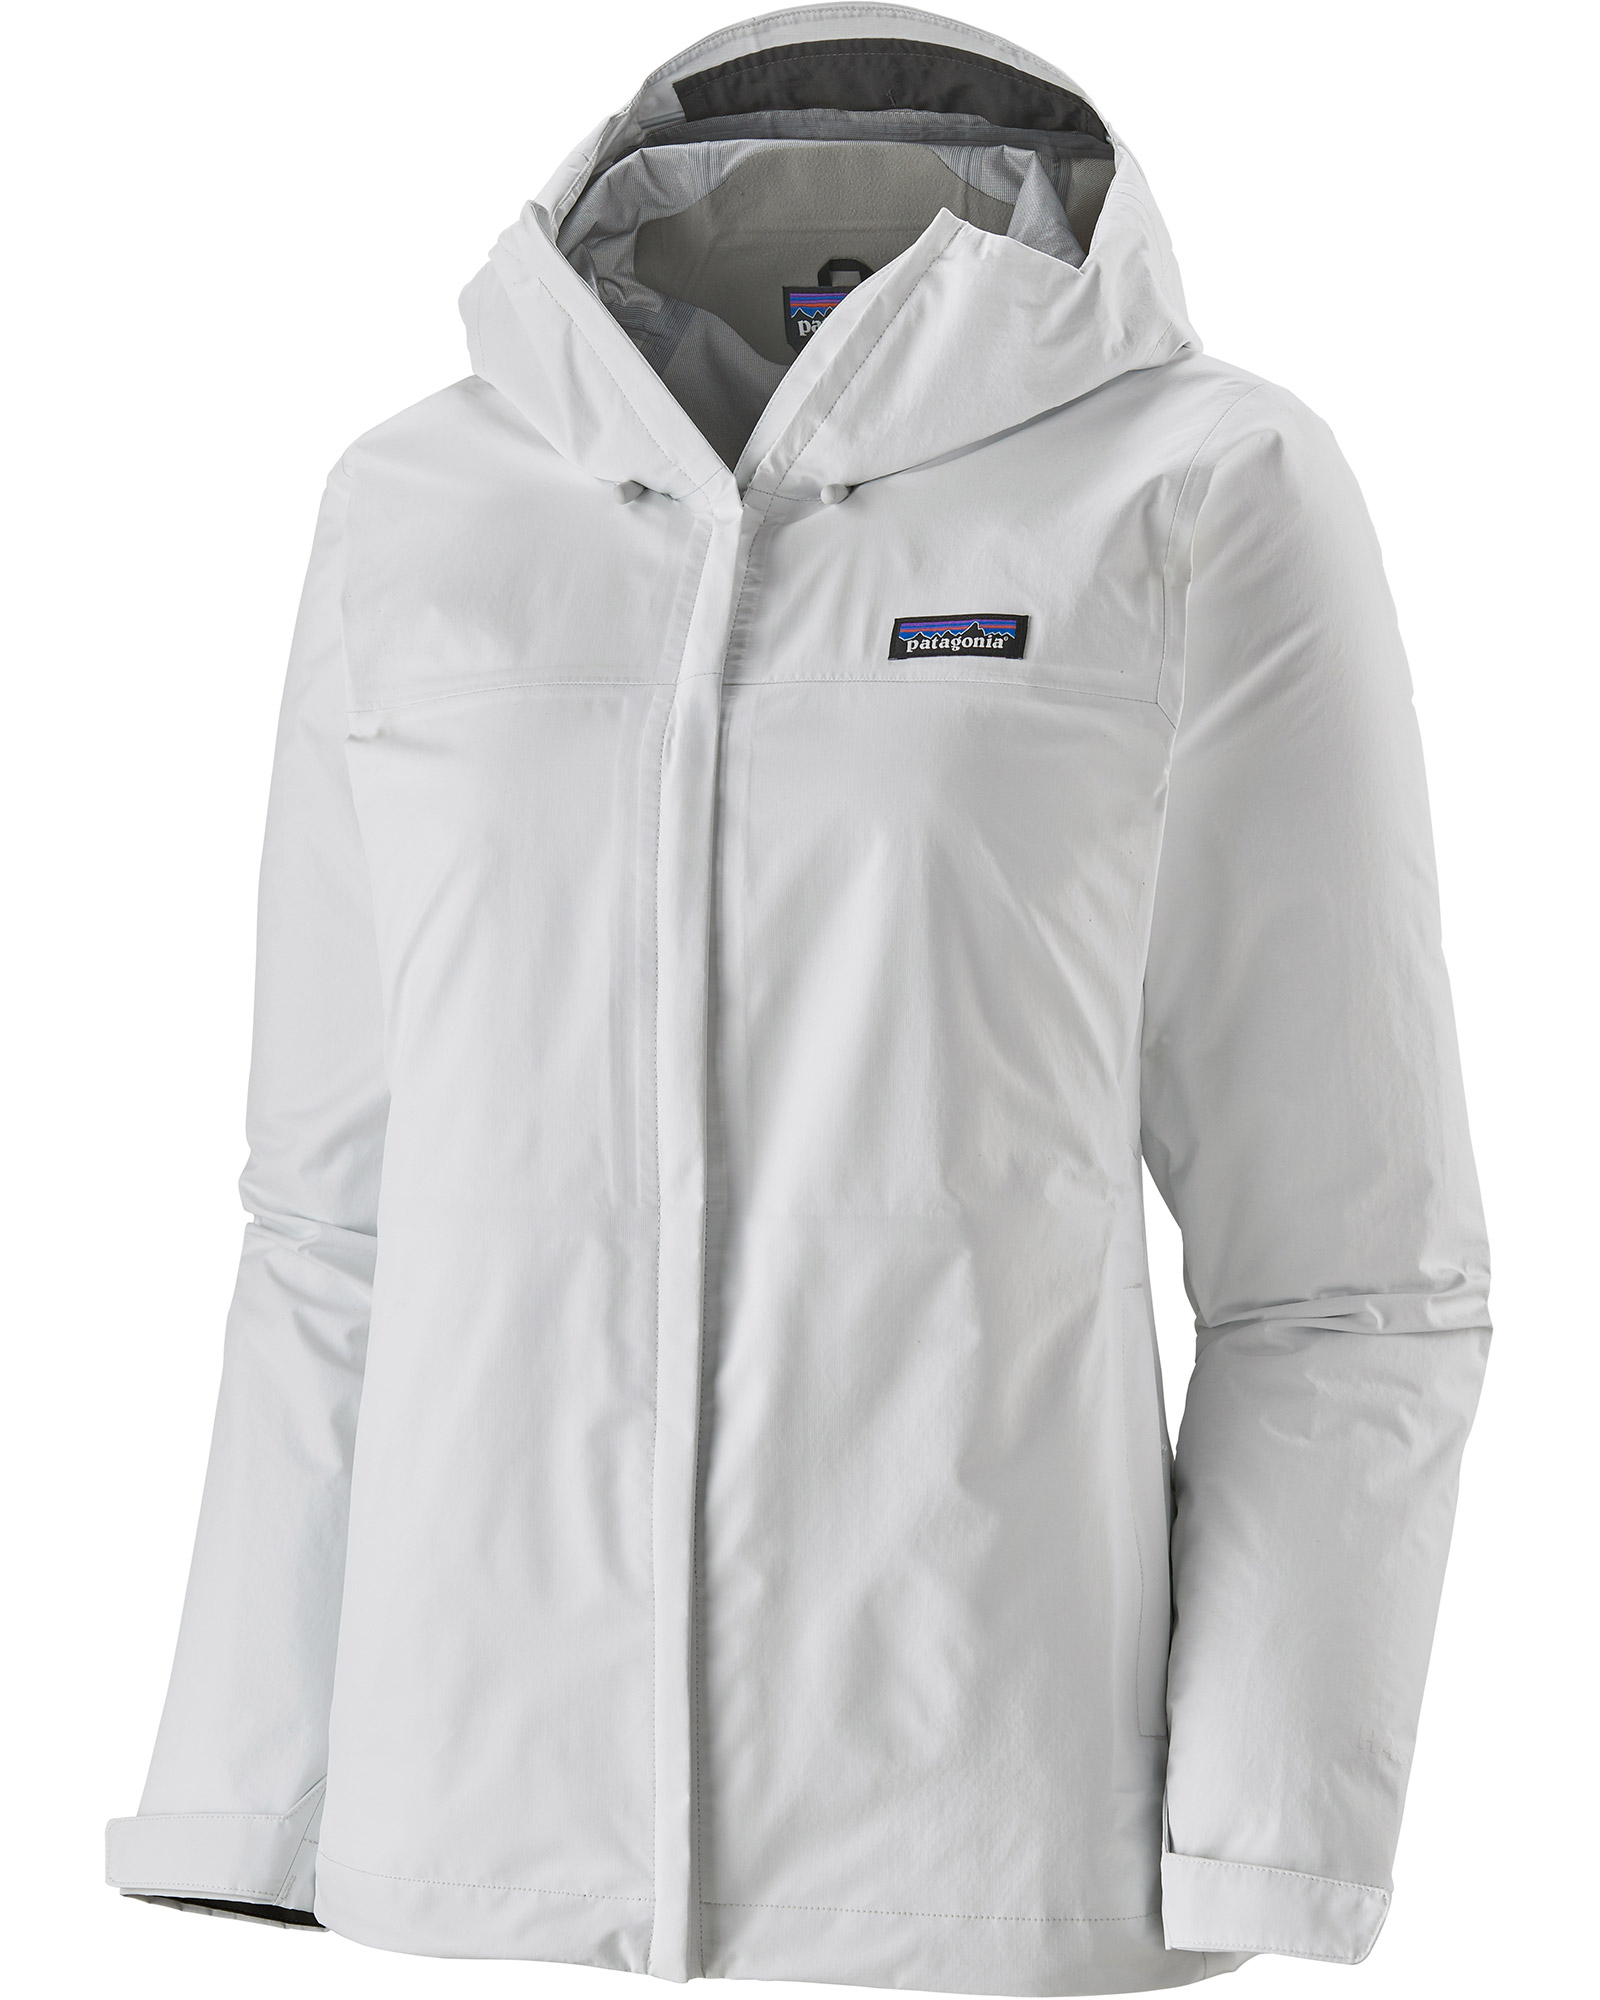 Patagonia Women's Torrentshell 3L Jacket 3